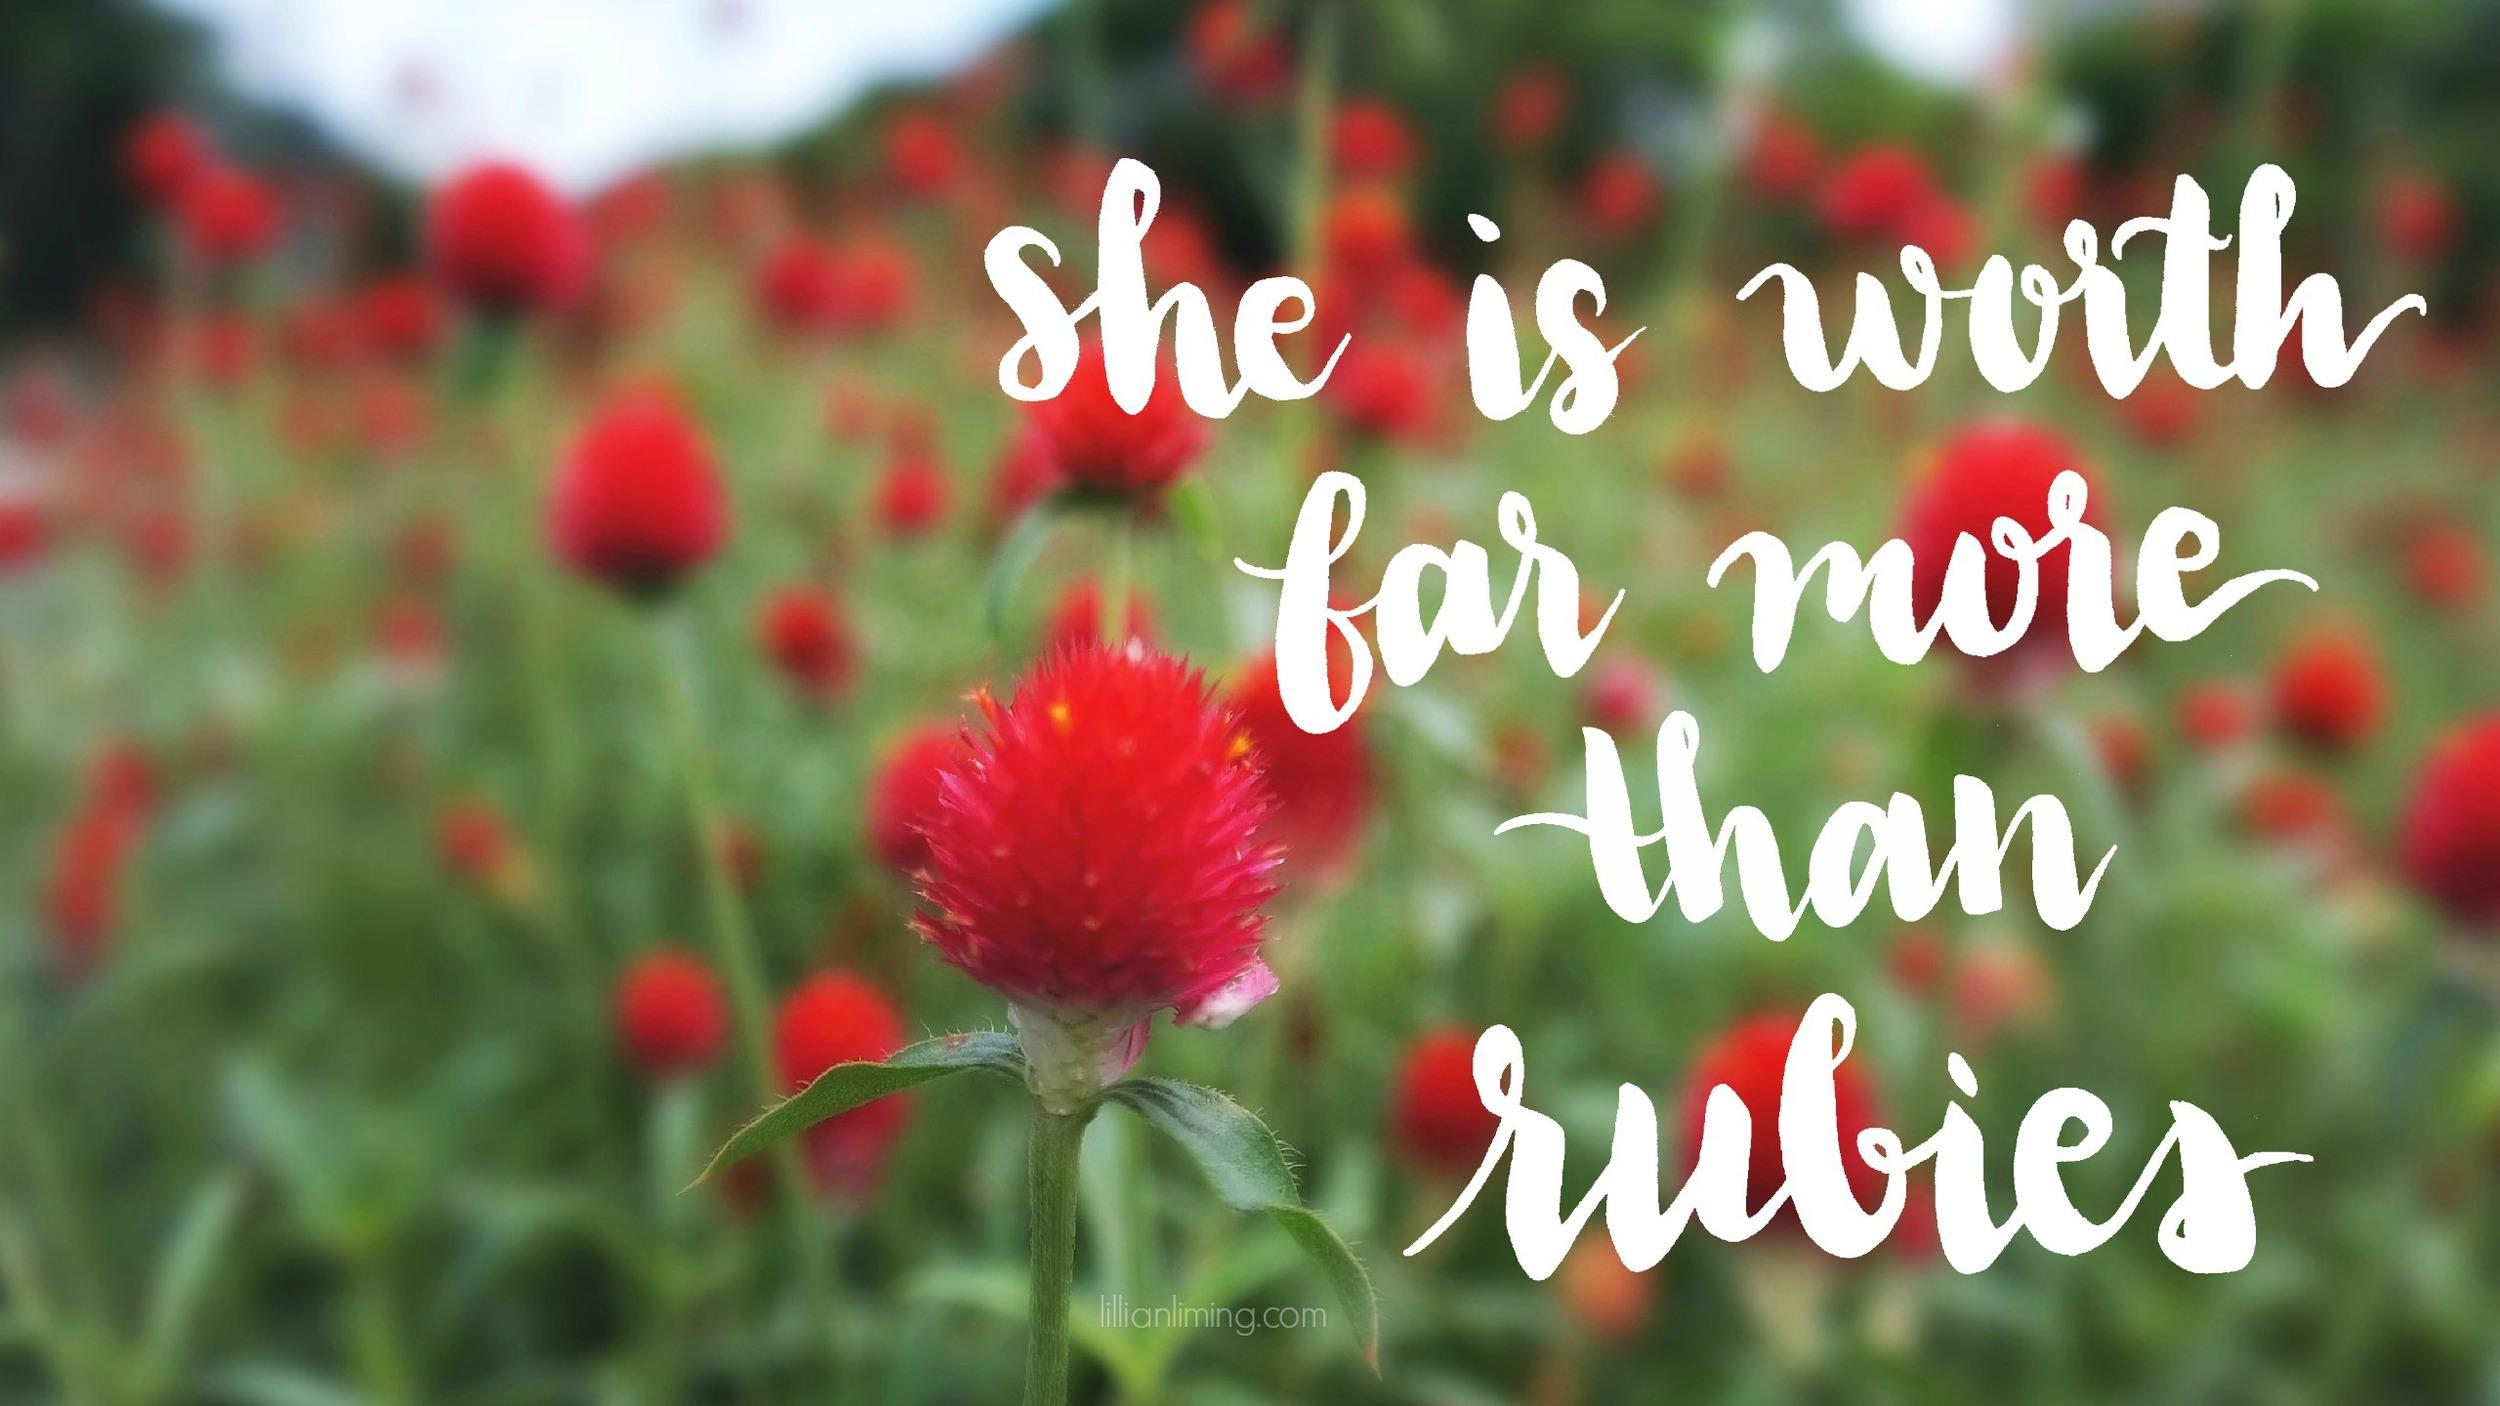 Free Download    DESKTOP WALLPAPER   Proverbs 31:10